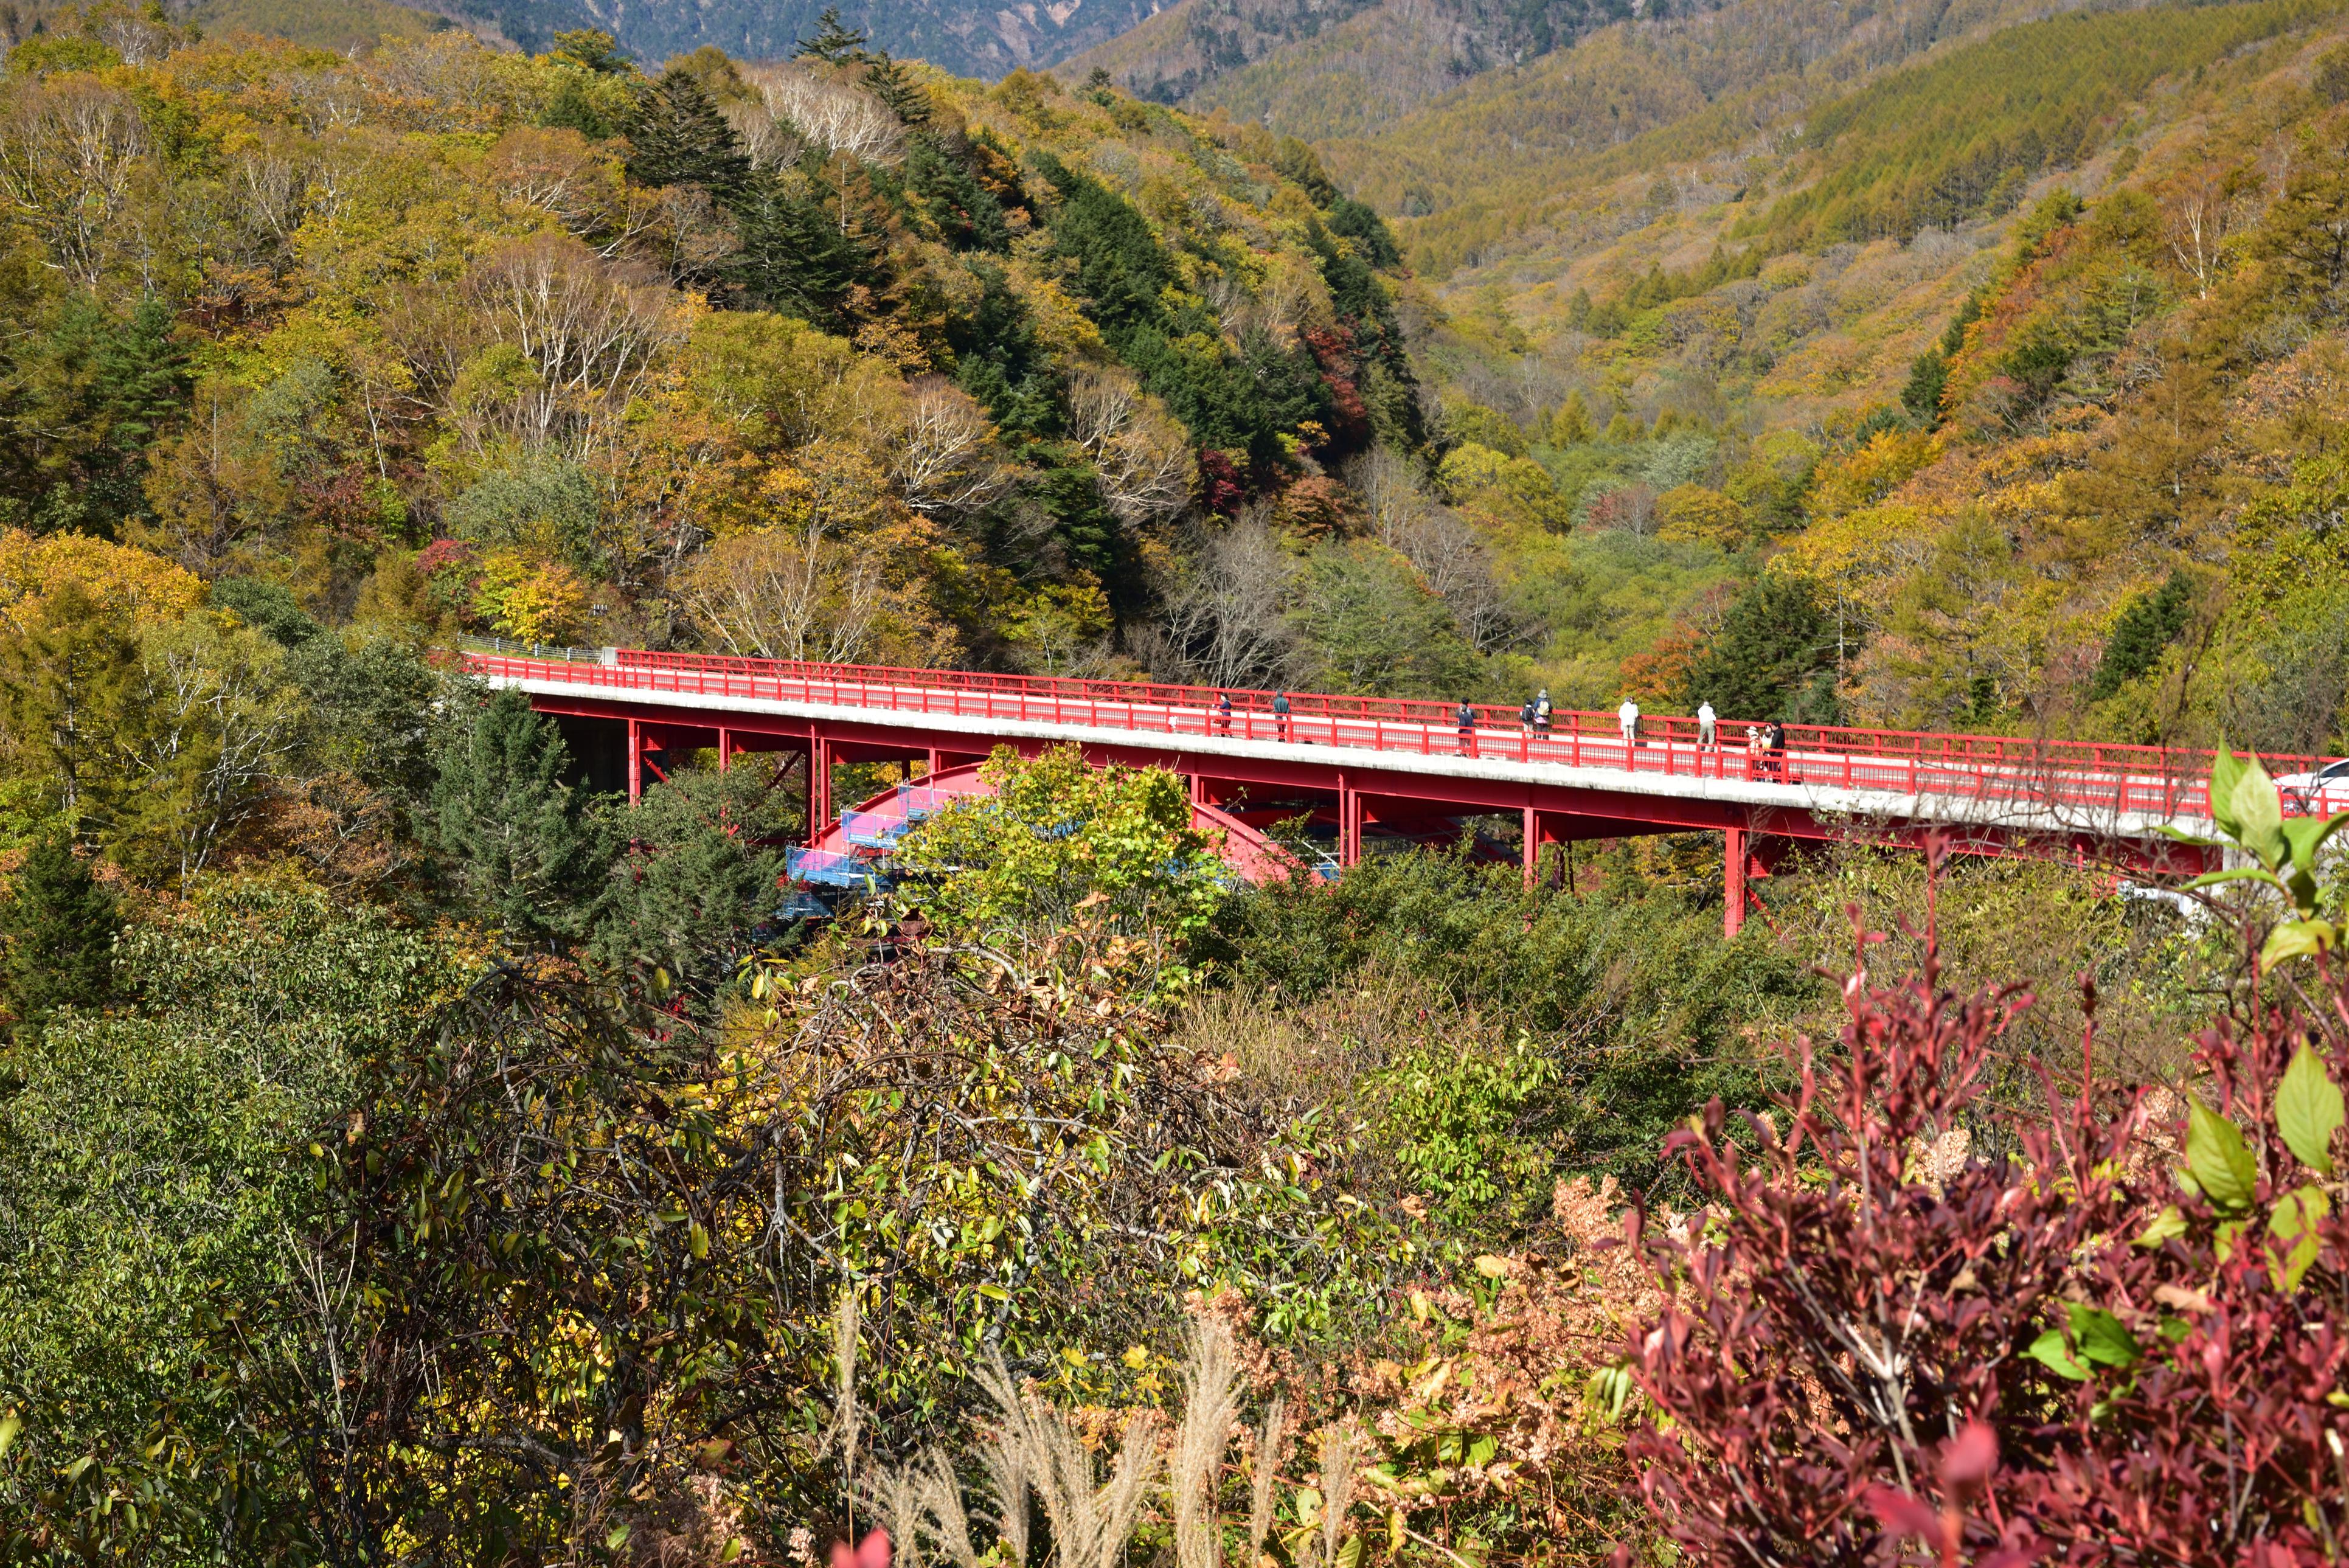 view of the red higashizawa bridge in autumn